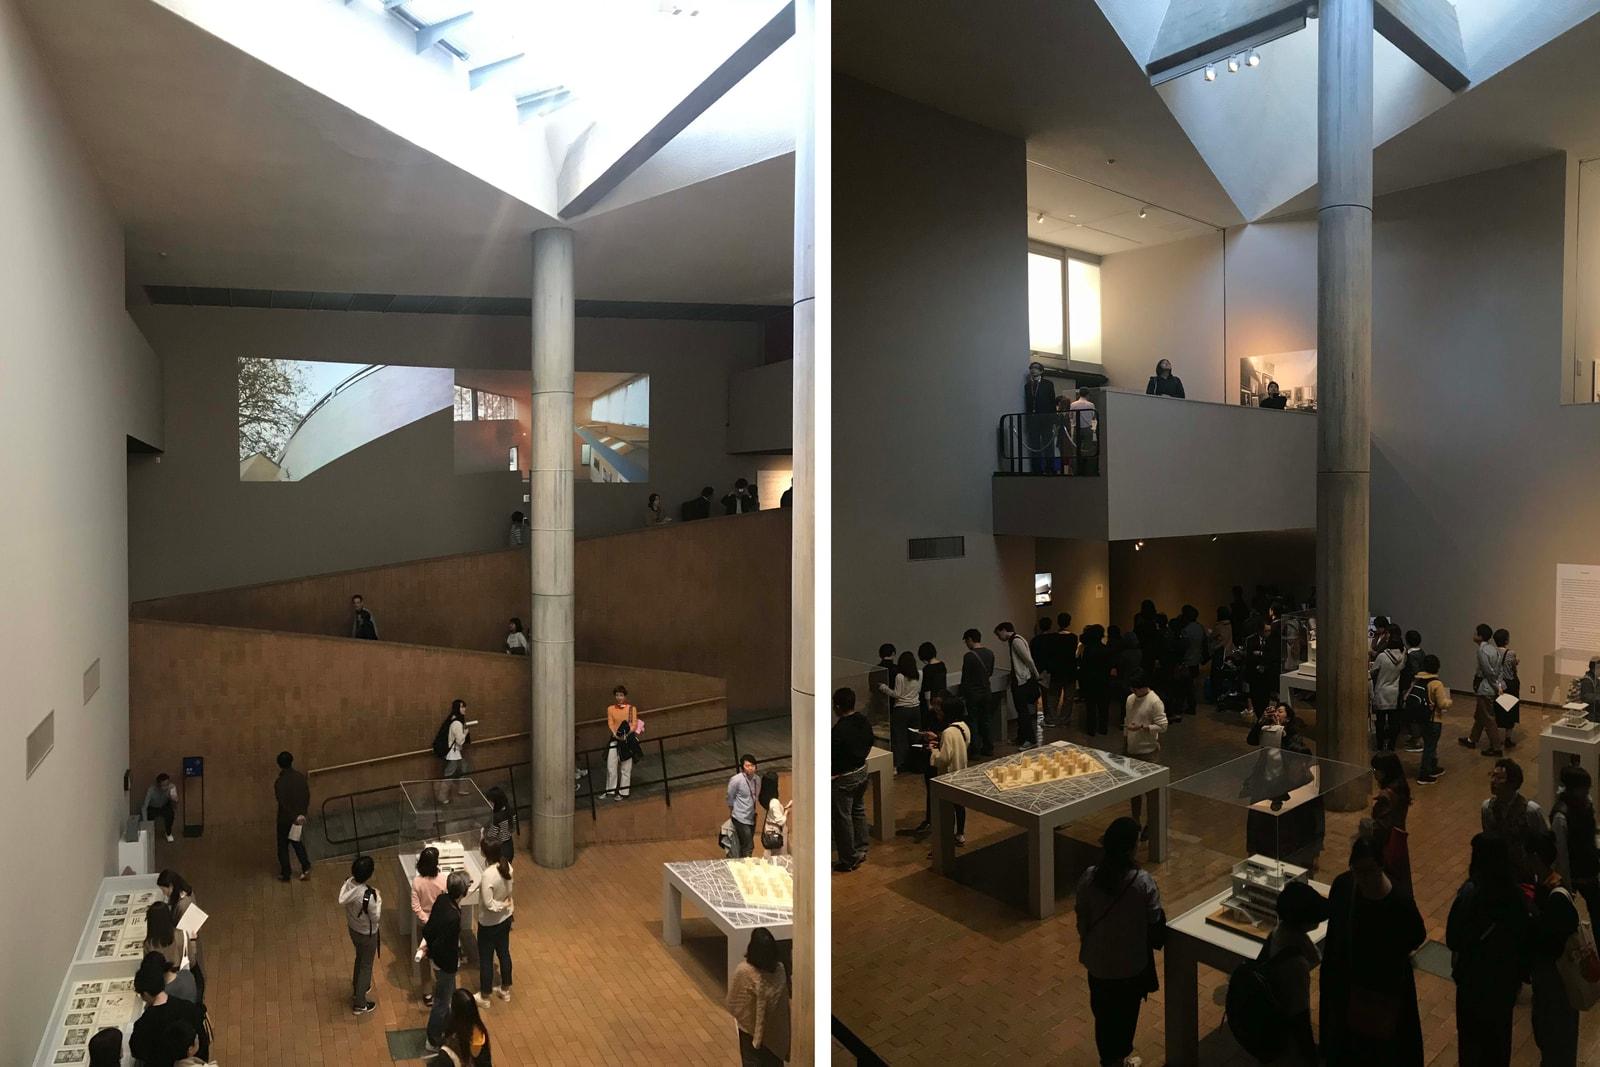 AaaM Architects 專訪國立西洋美術館副館長,談「現代建築之父」Le Corbusier!